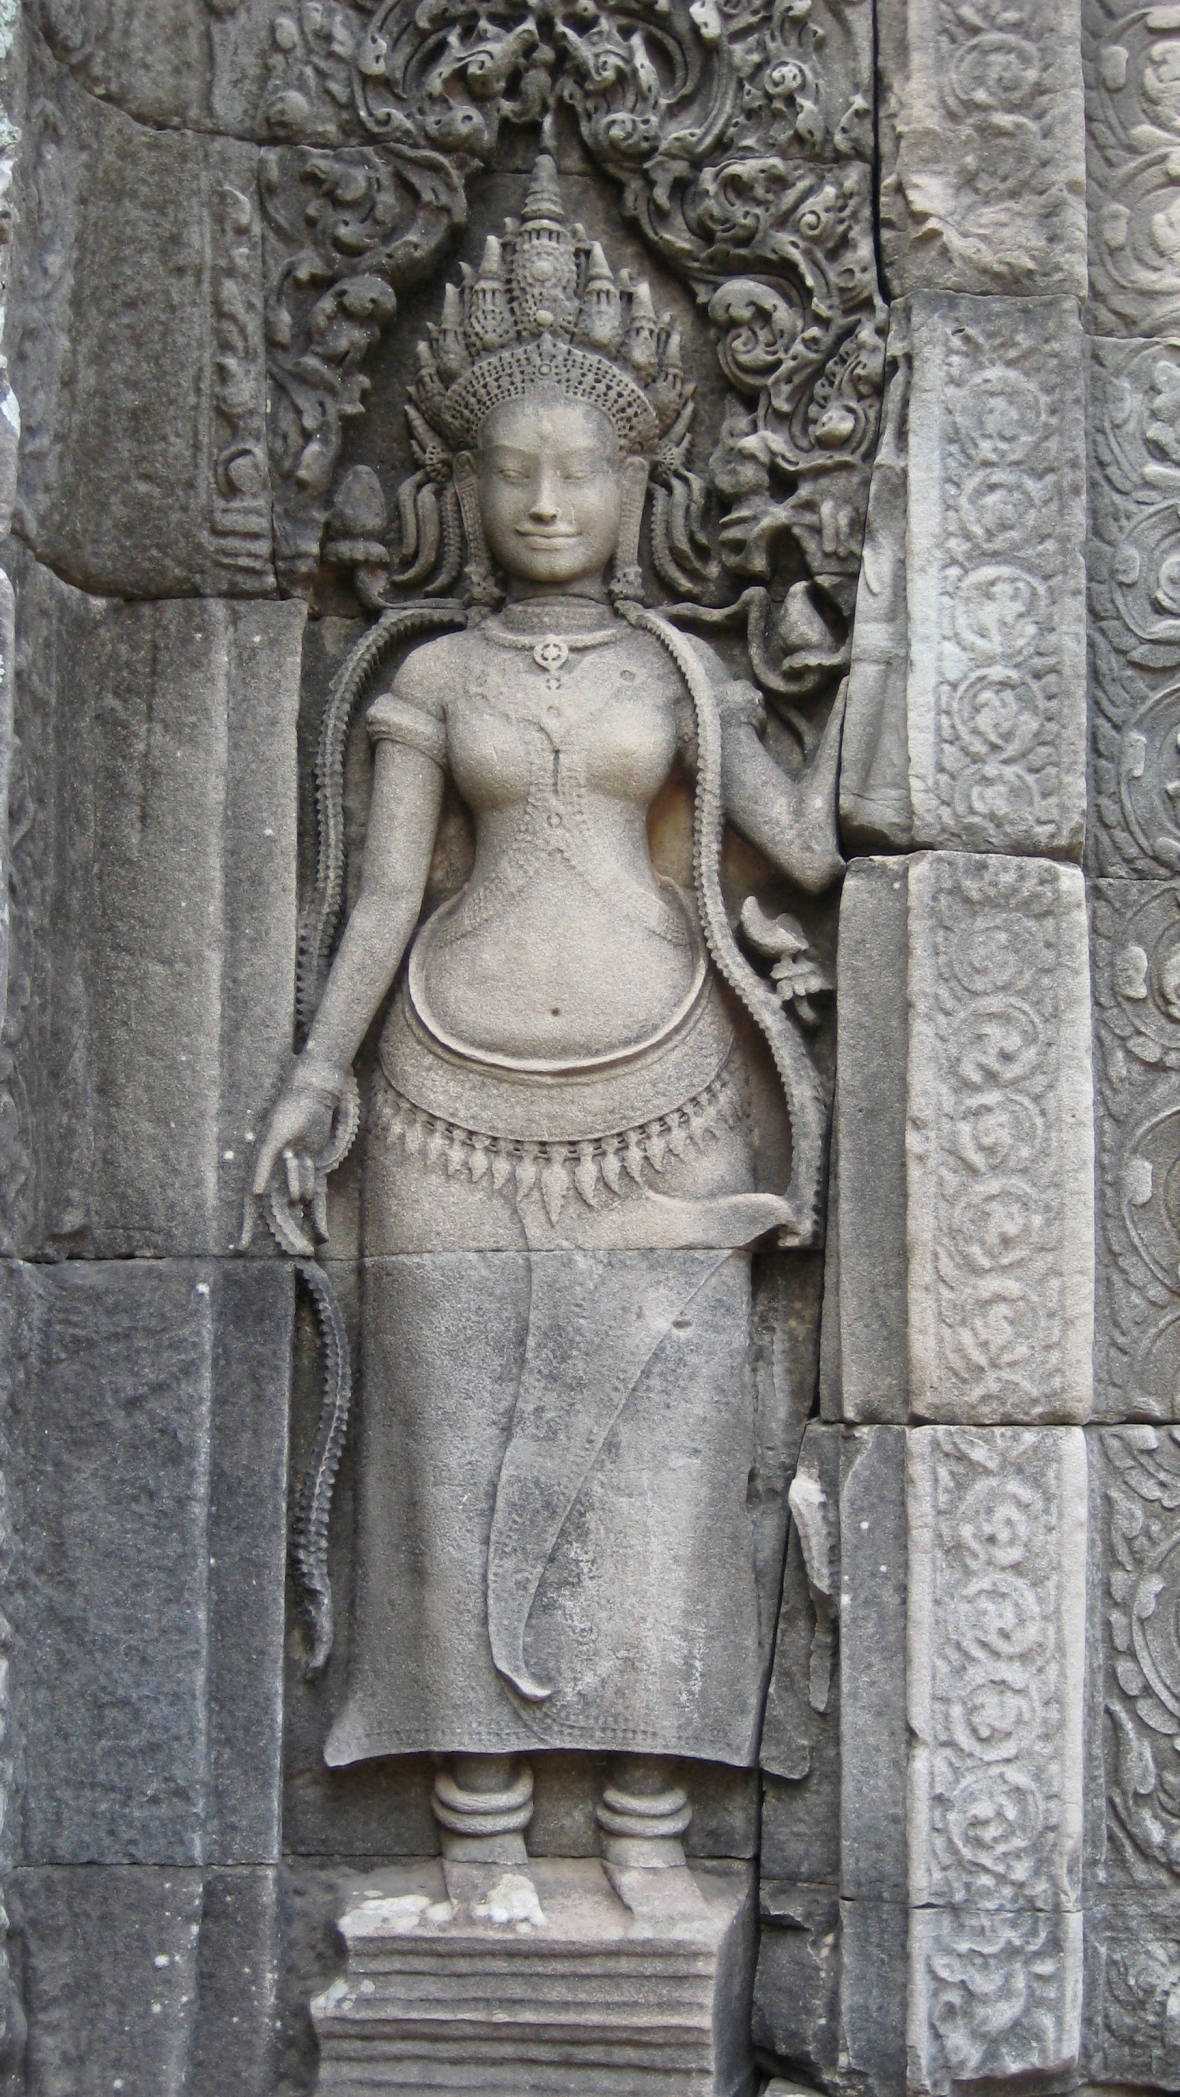 The feminine representation of spirituality Apsara